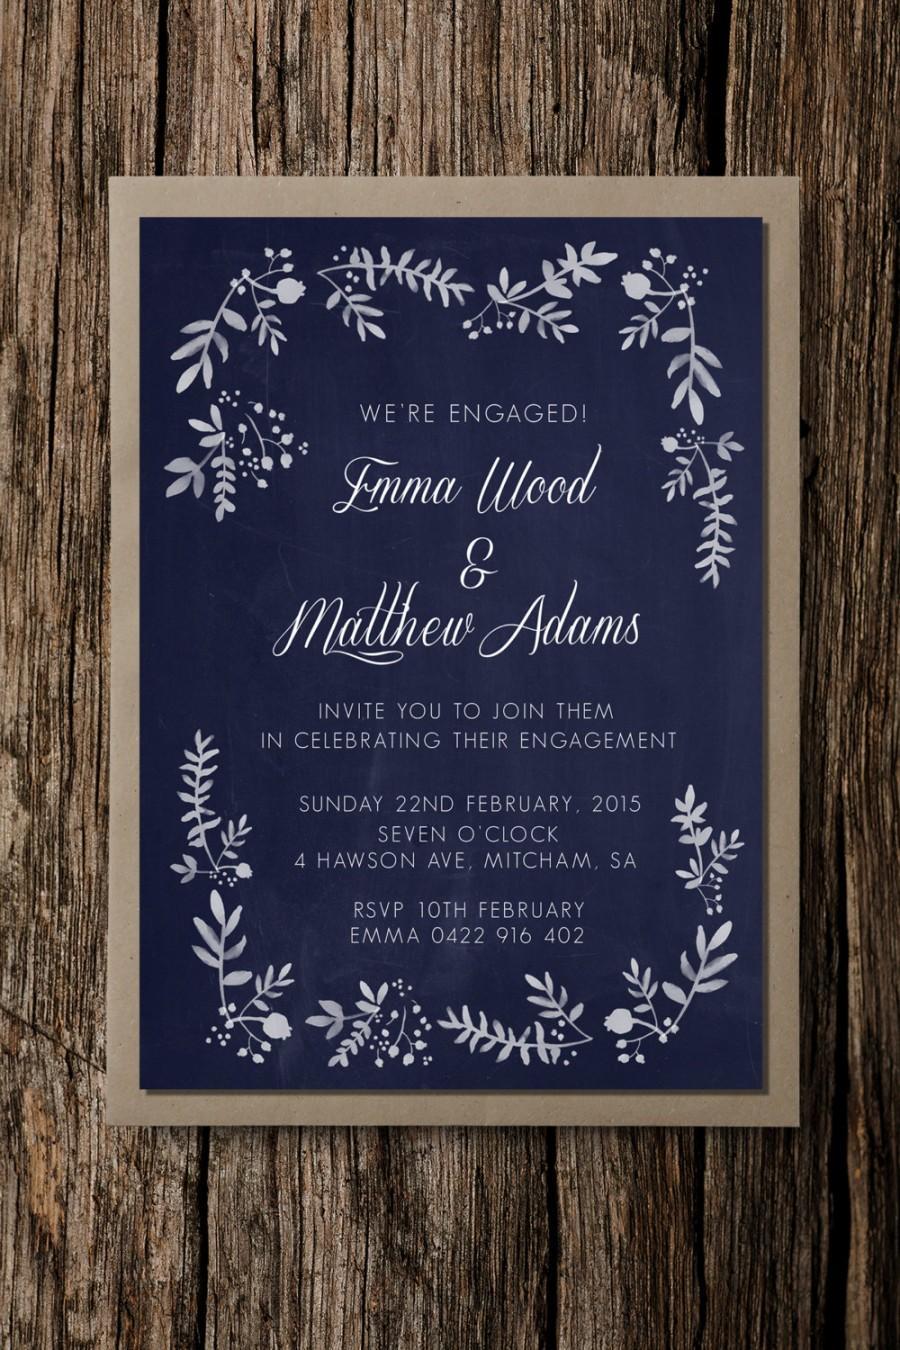 Свадьба - Engagement party invitation, Rustic Foliage, save the date, beautiful wedding invite, elegant wedding, navy, floral invite